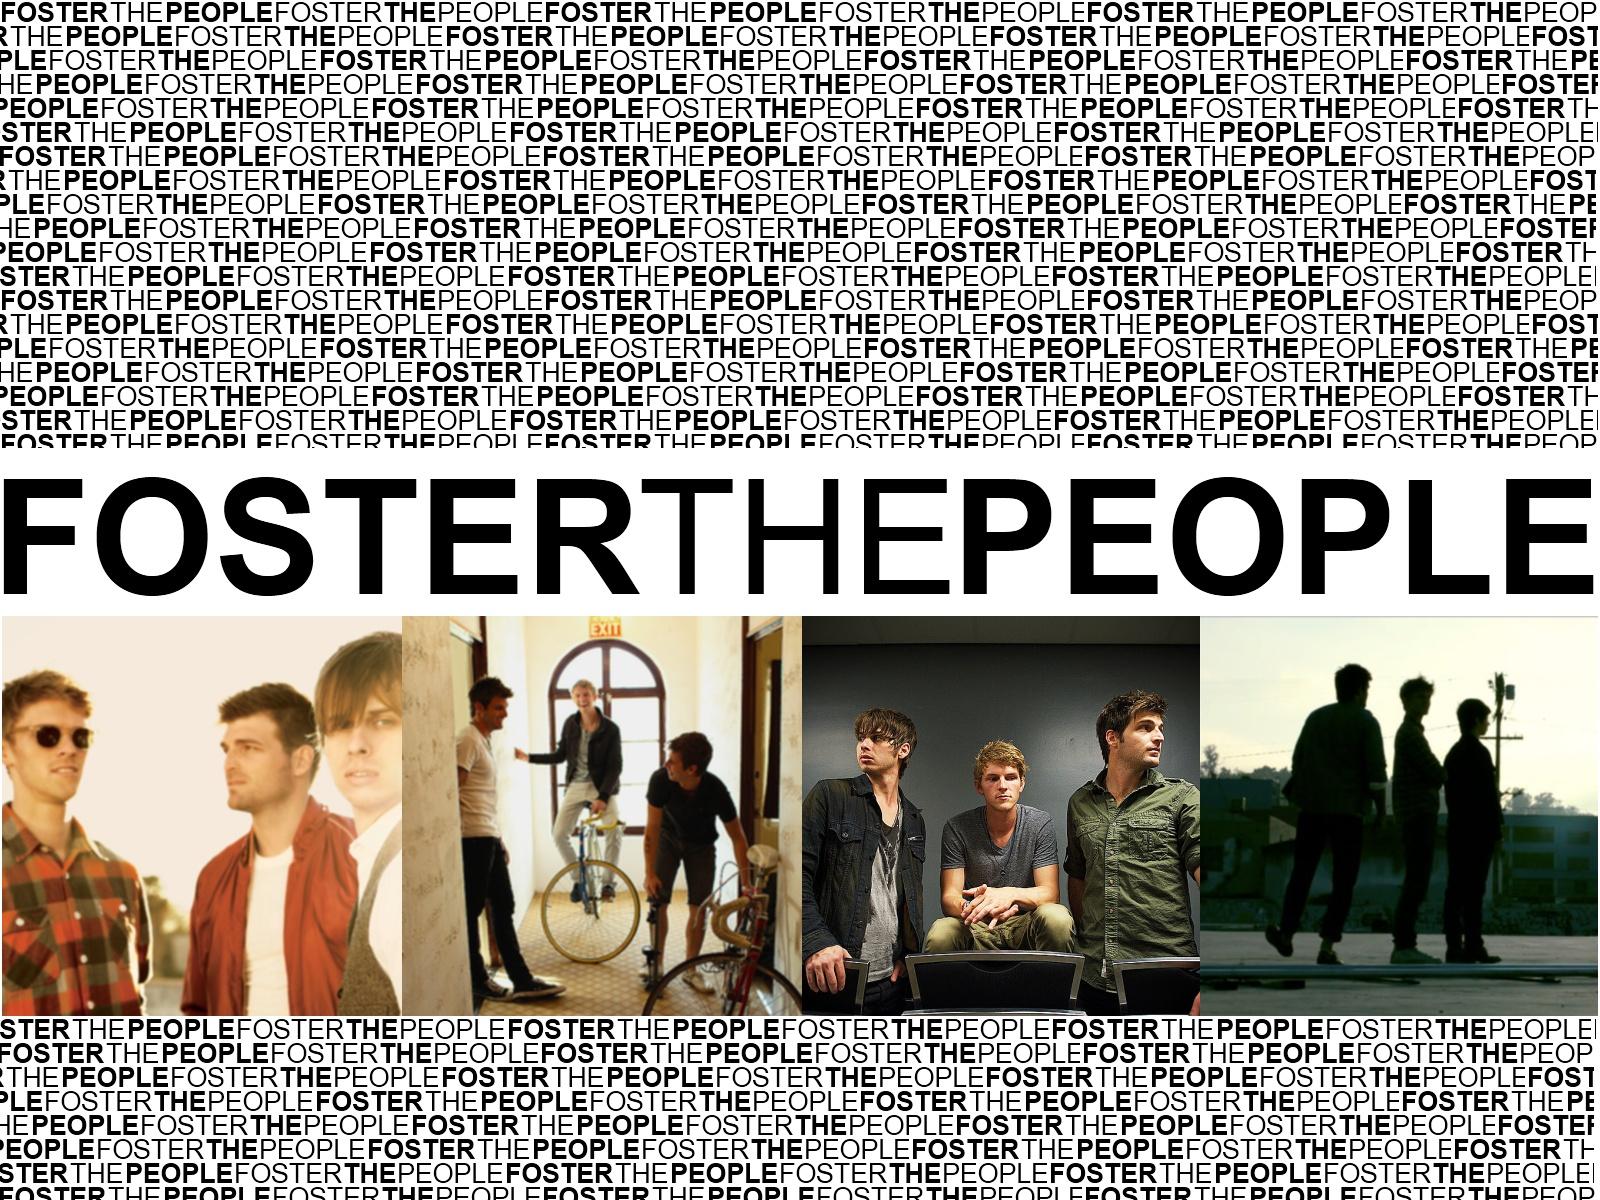 http://2.bp.blogspot.com/-gCuI_piYs3s/TxfVXgKryGI/AAAAAAAAEAA/XKMacsu5c5M/s1600/foster-the-people-wallpapers_32199_1600x1200.jpg